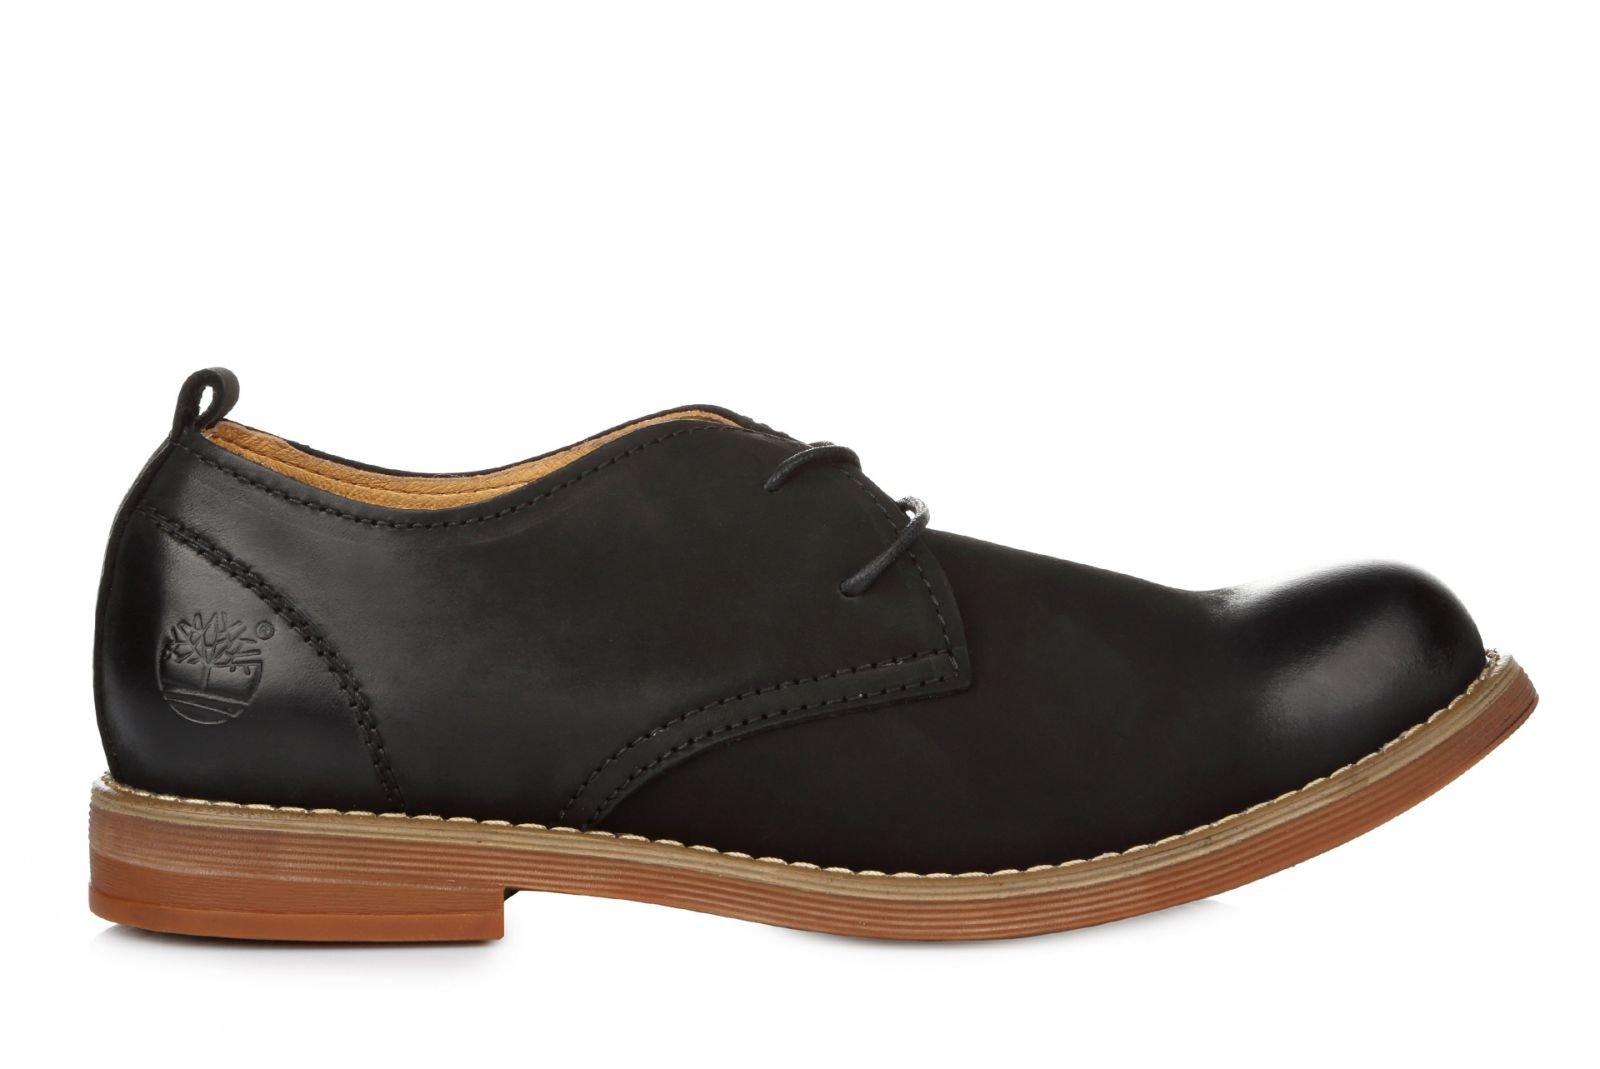 50dc7d4452db Timberland Hartwick Plain Toe Oxford Leather Black, купить обувь ...